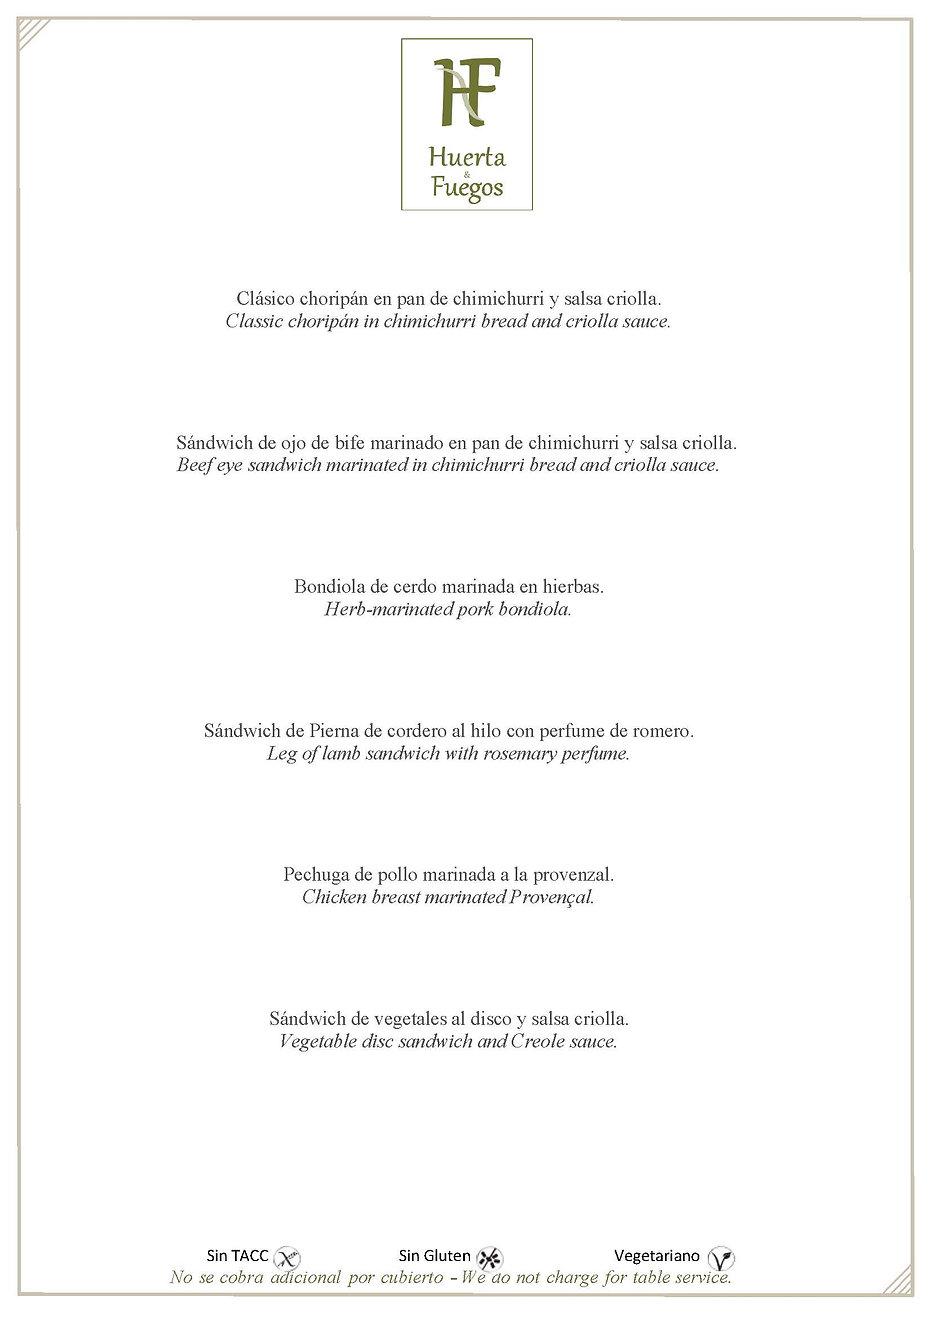 menu Huerta & Fuego